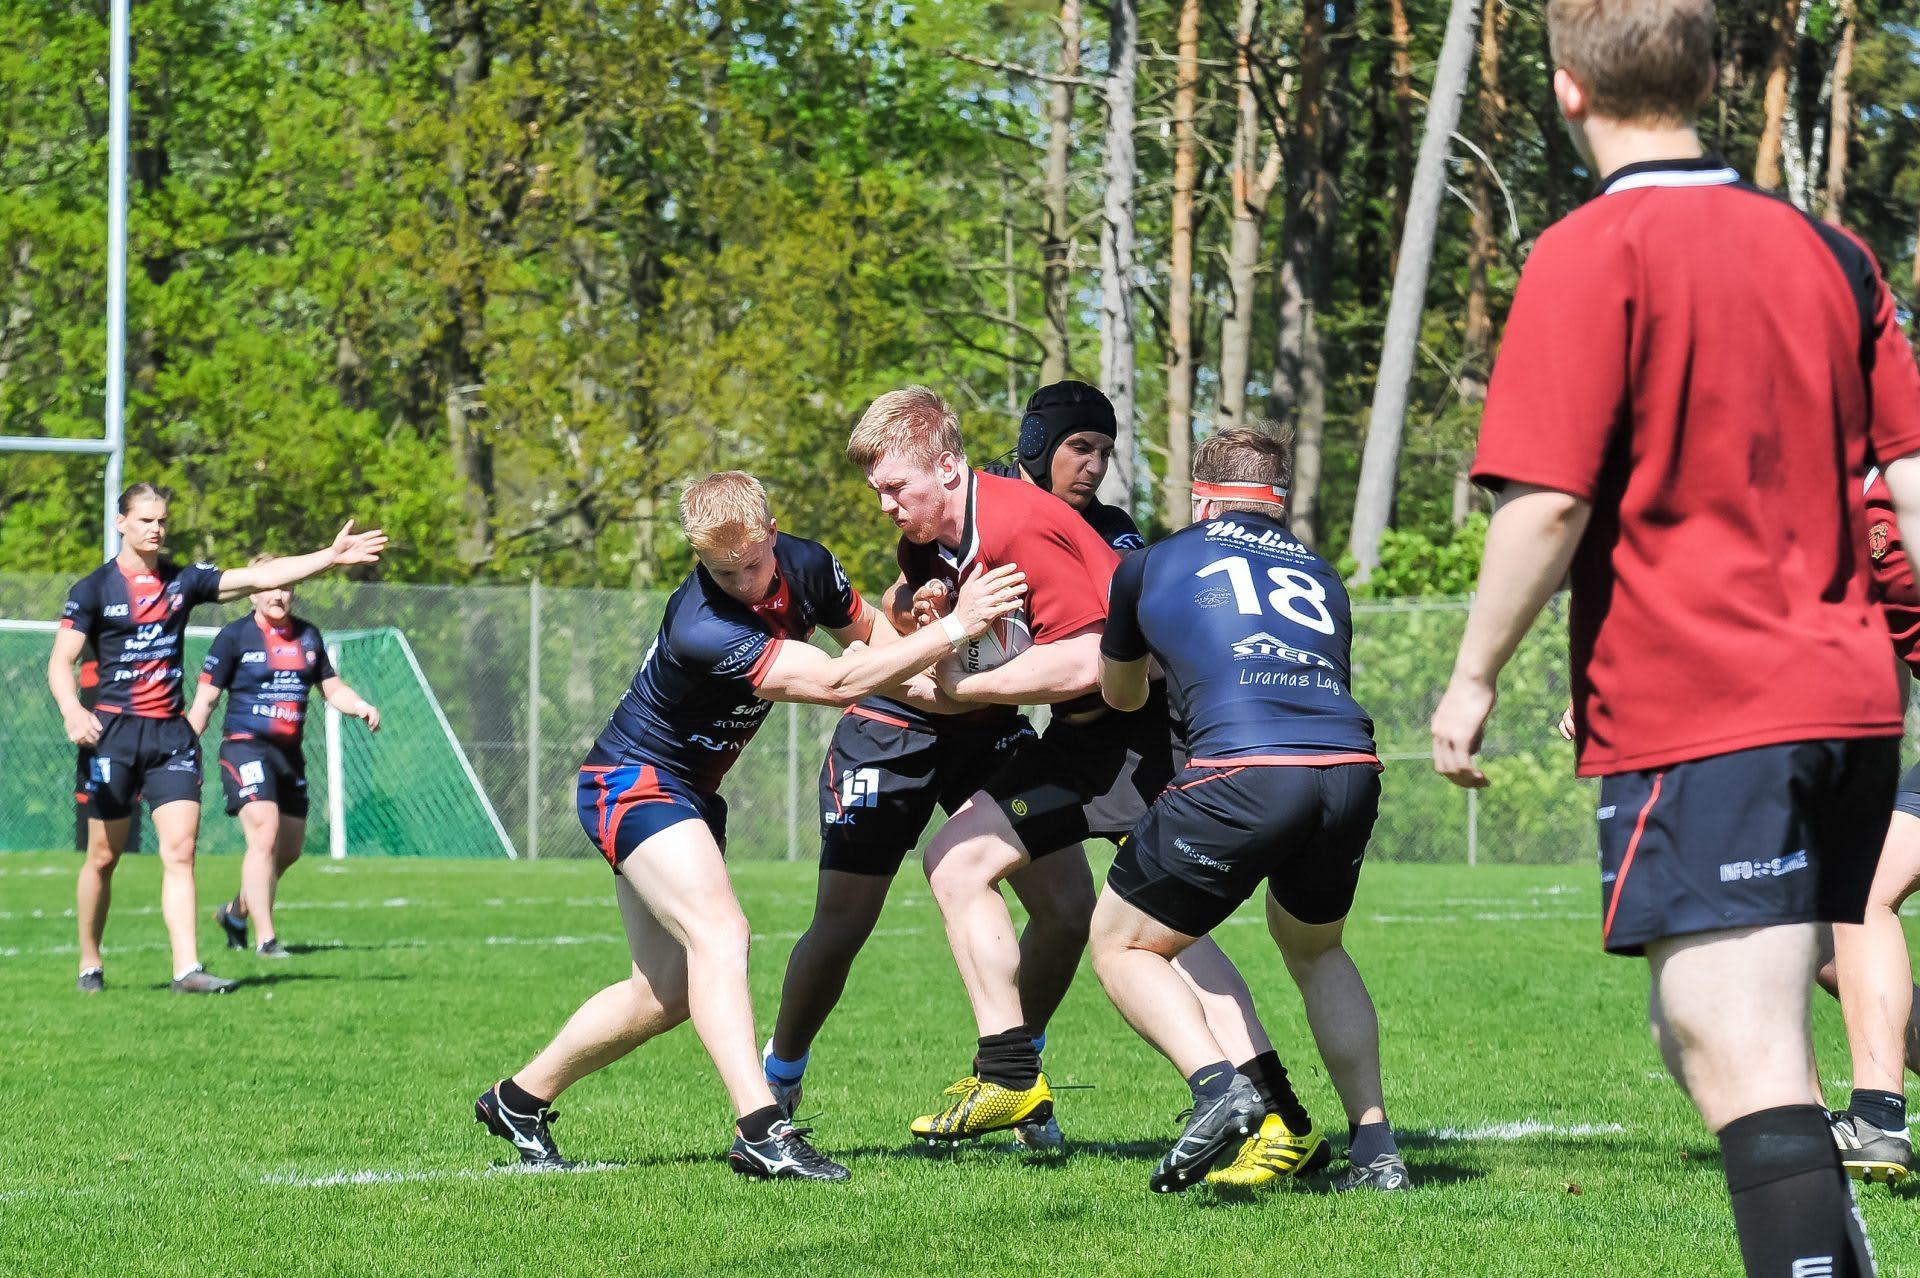 Kalmar Södra Rugby vs Lugi Lions 170521